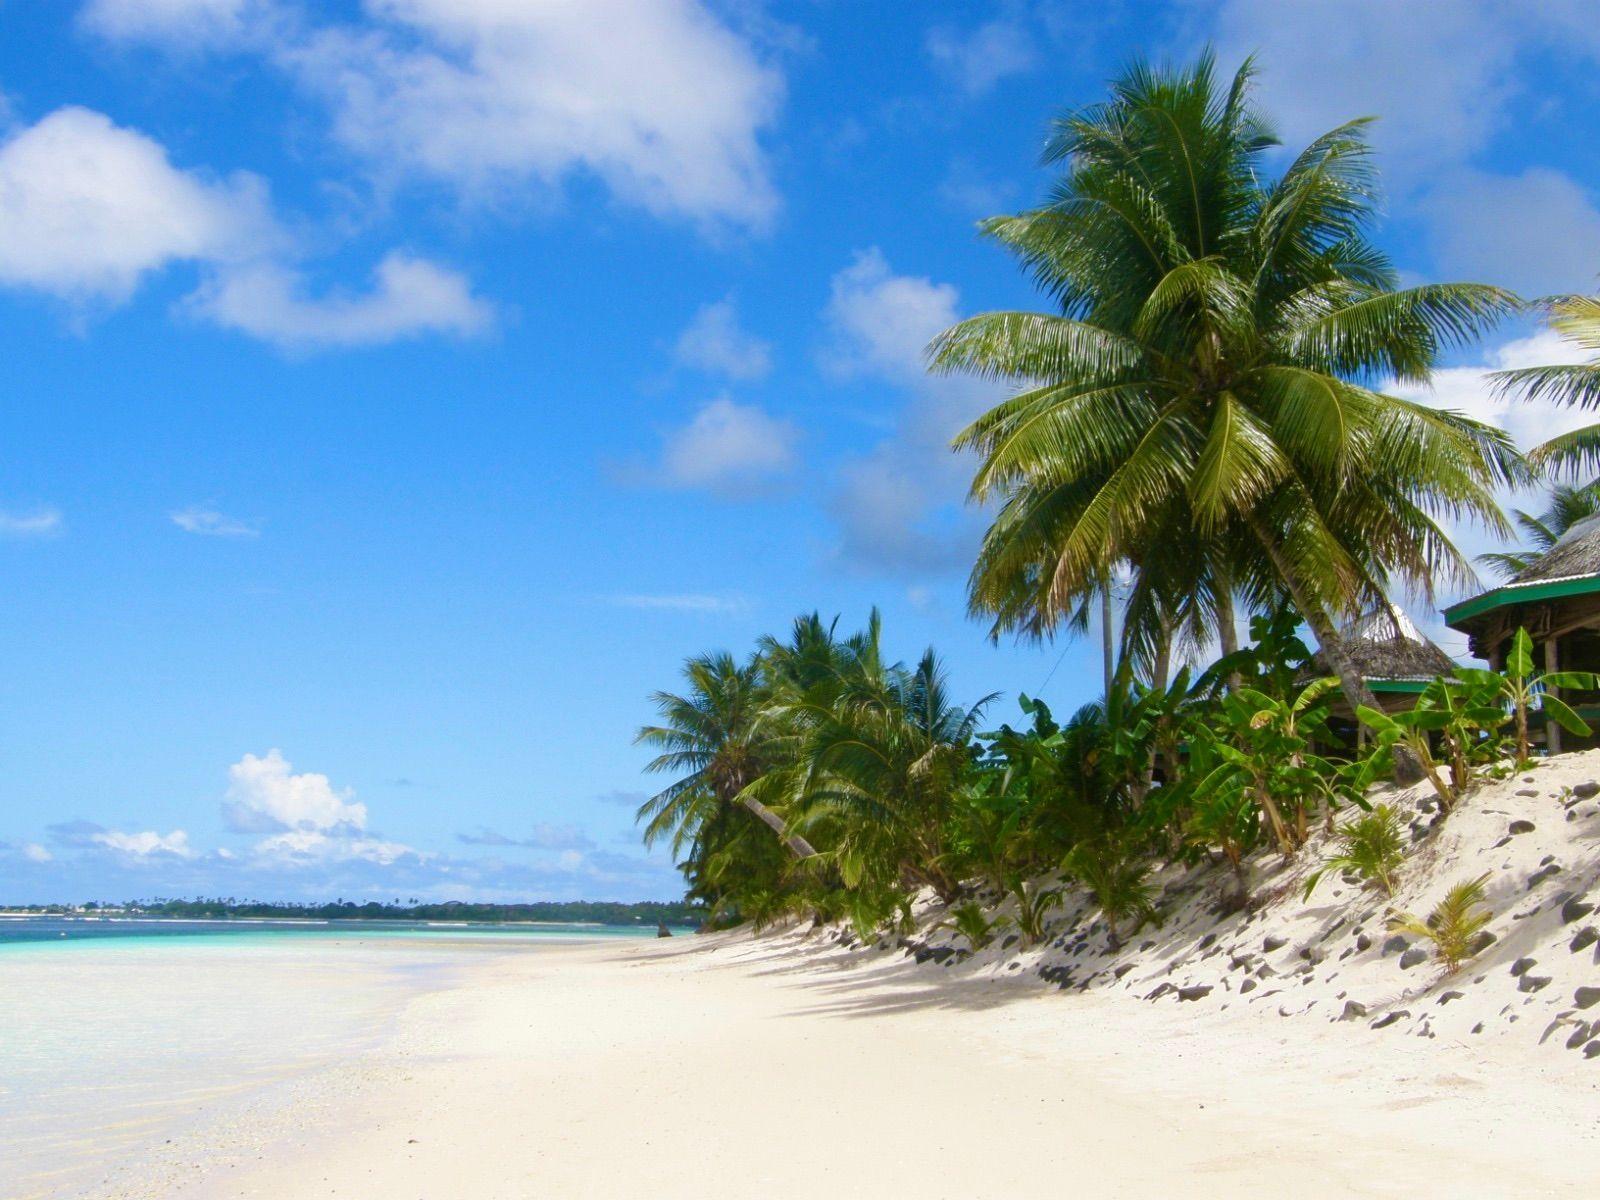 Postcard from An Island Treasure